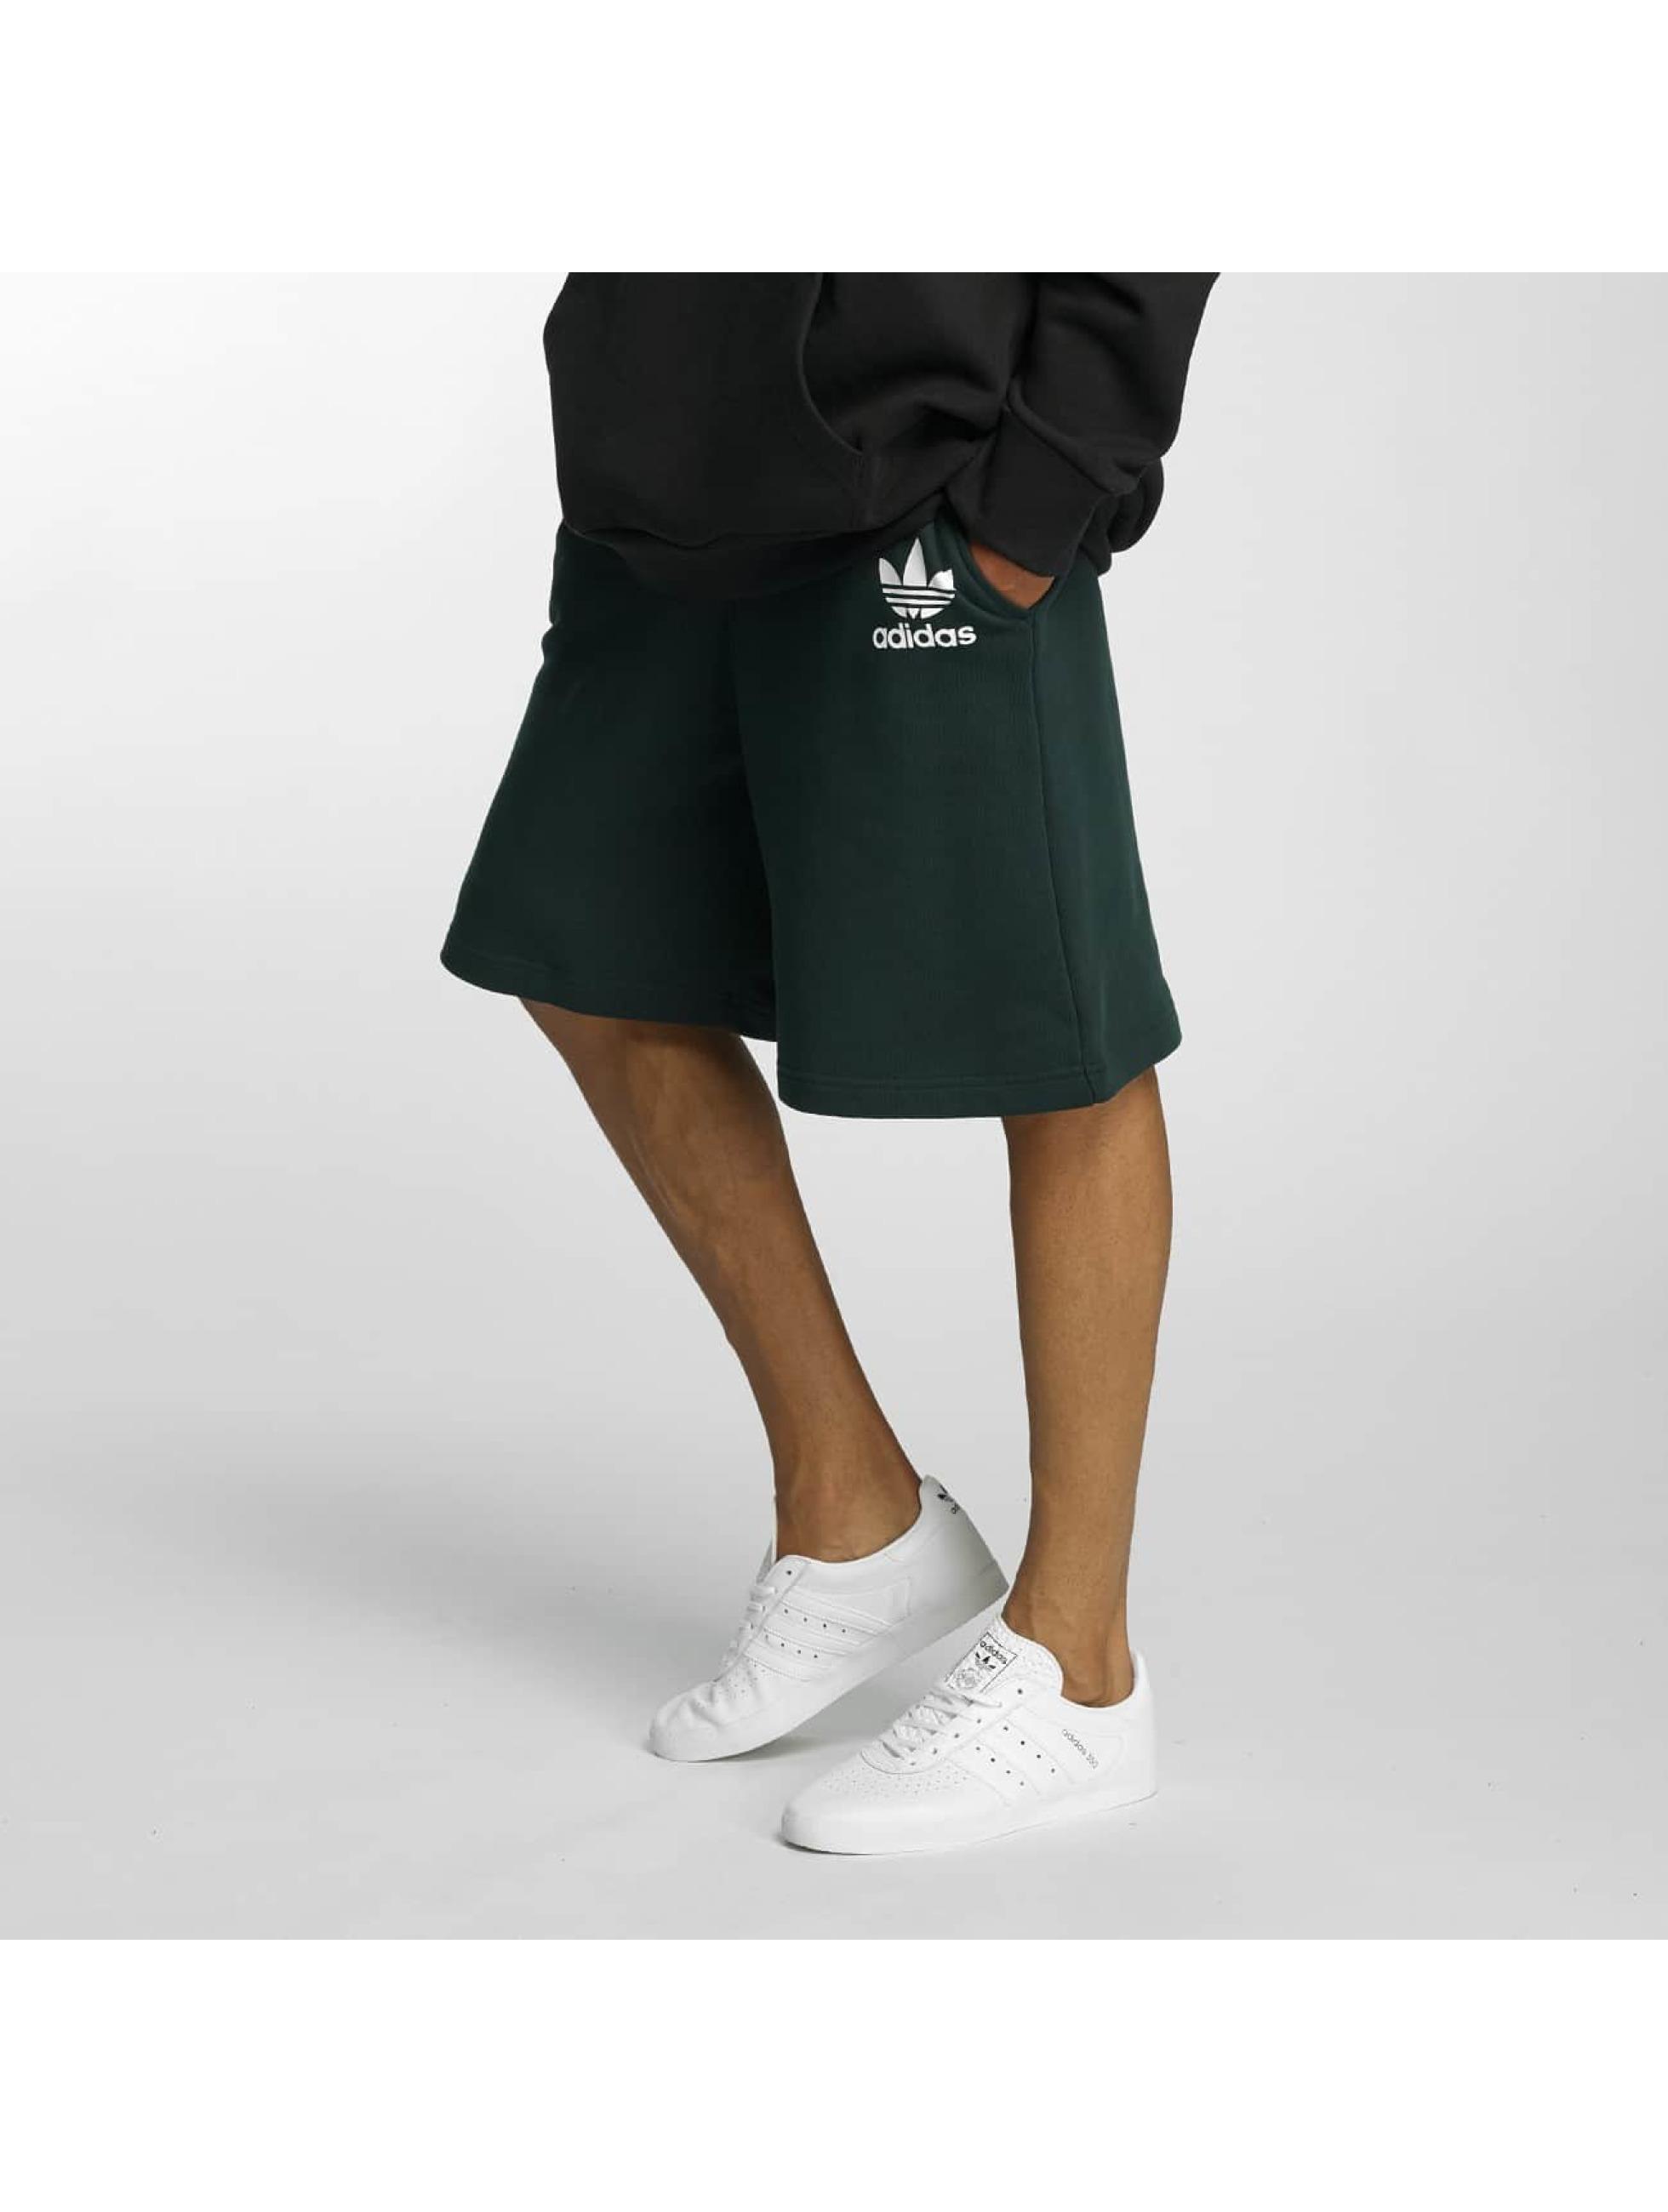 adidas originals Short ADC F vert